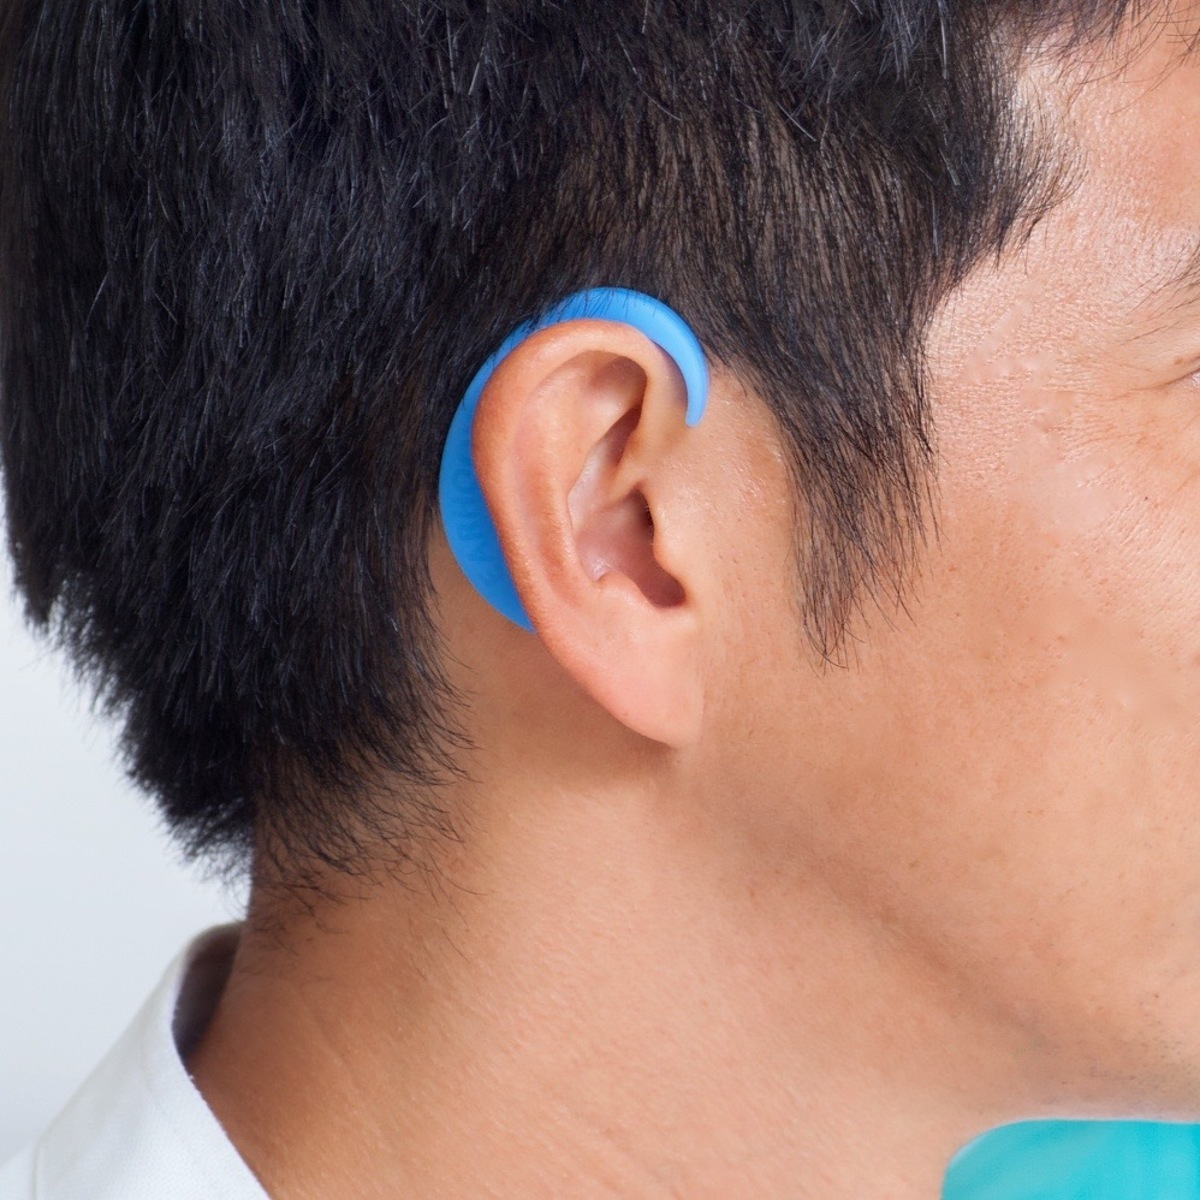 EARHOOKの開発者は、医学博士で日本整形外科学会専門医の小田博さん|ネオジム磁石で耳裏のツボを刺激。EARHOOK(イヤーフック)